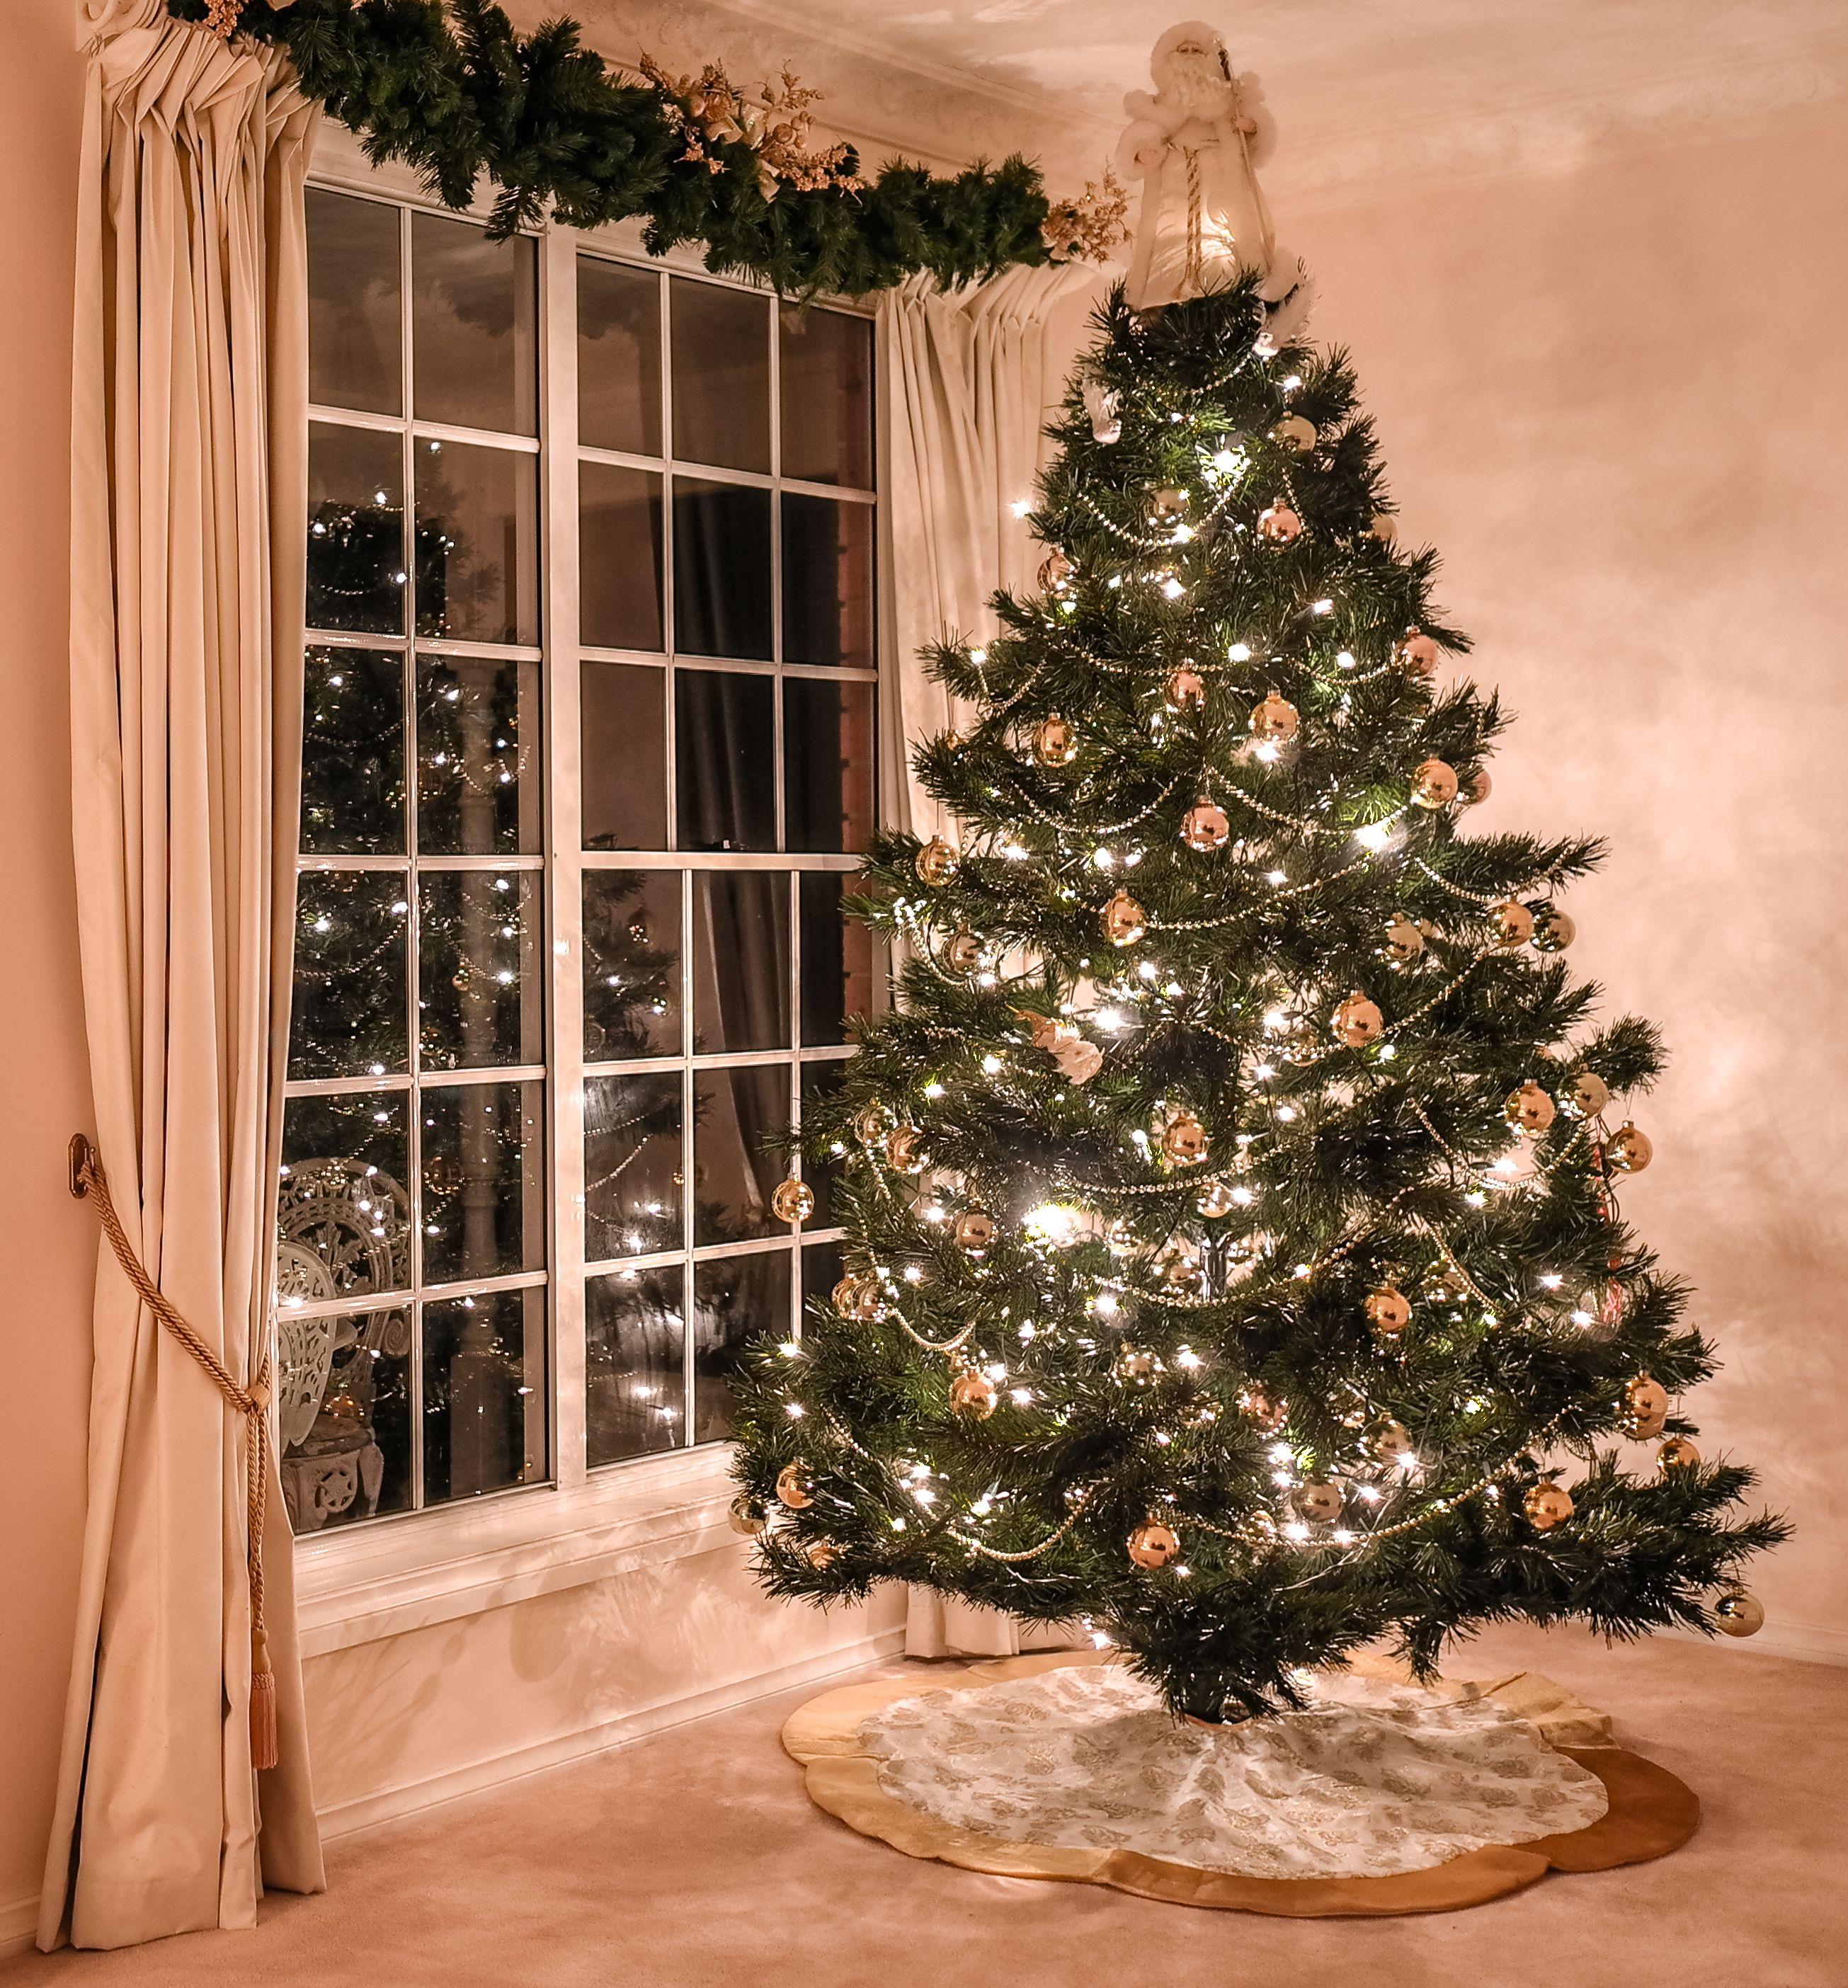 Amazing 10 Christmas Decoration Hanging Hacks How To Hang Your Holiday Wiring Cloud Loplapiotaidewilluminateatxorg